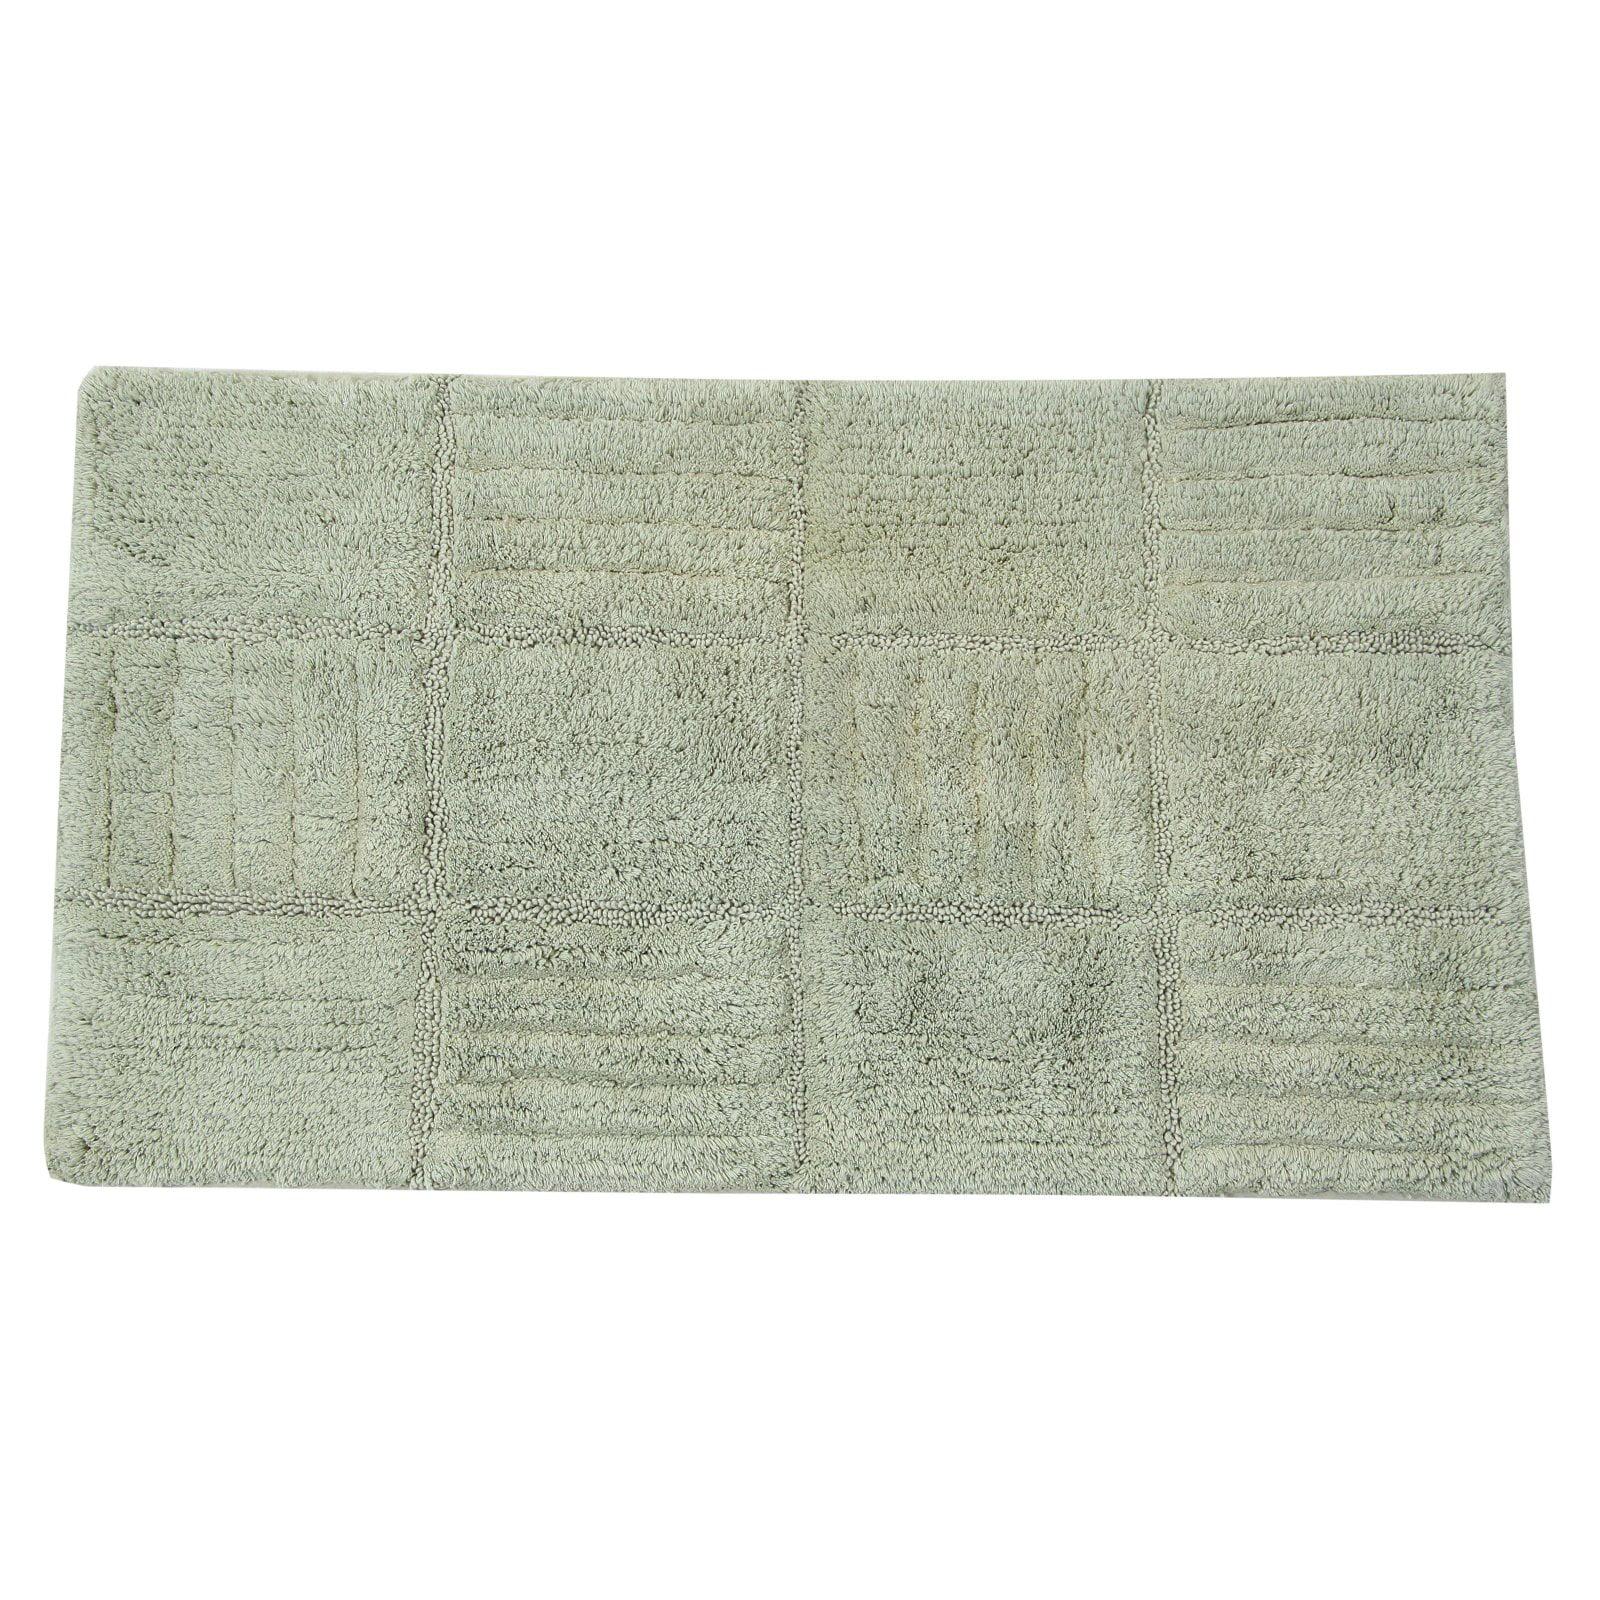 Textile Decor Elegance Collection Chakkar Board Bath Rug